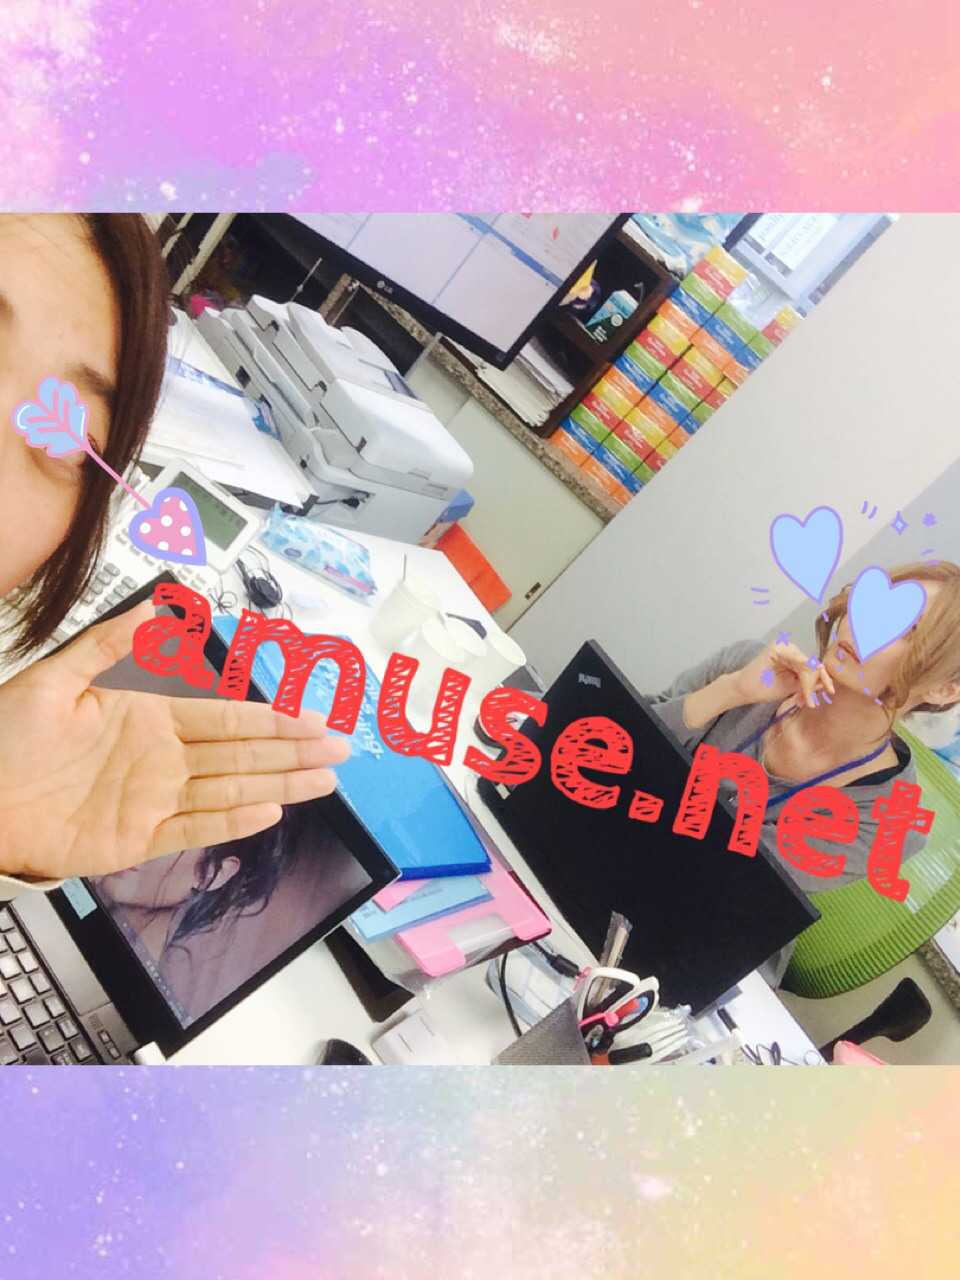 S__13705560.jpg